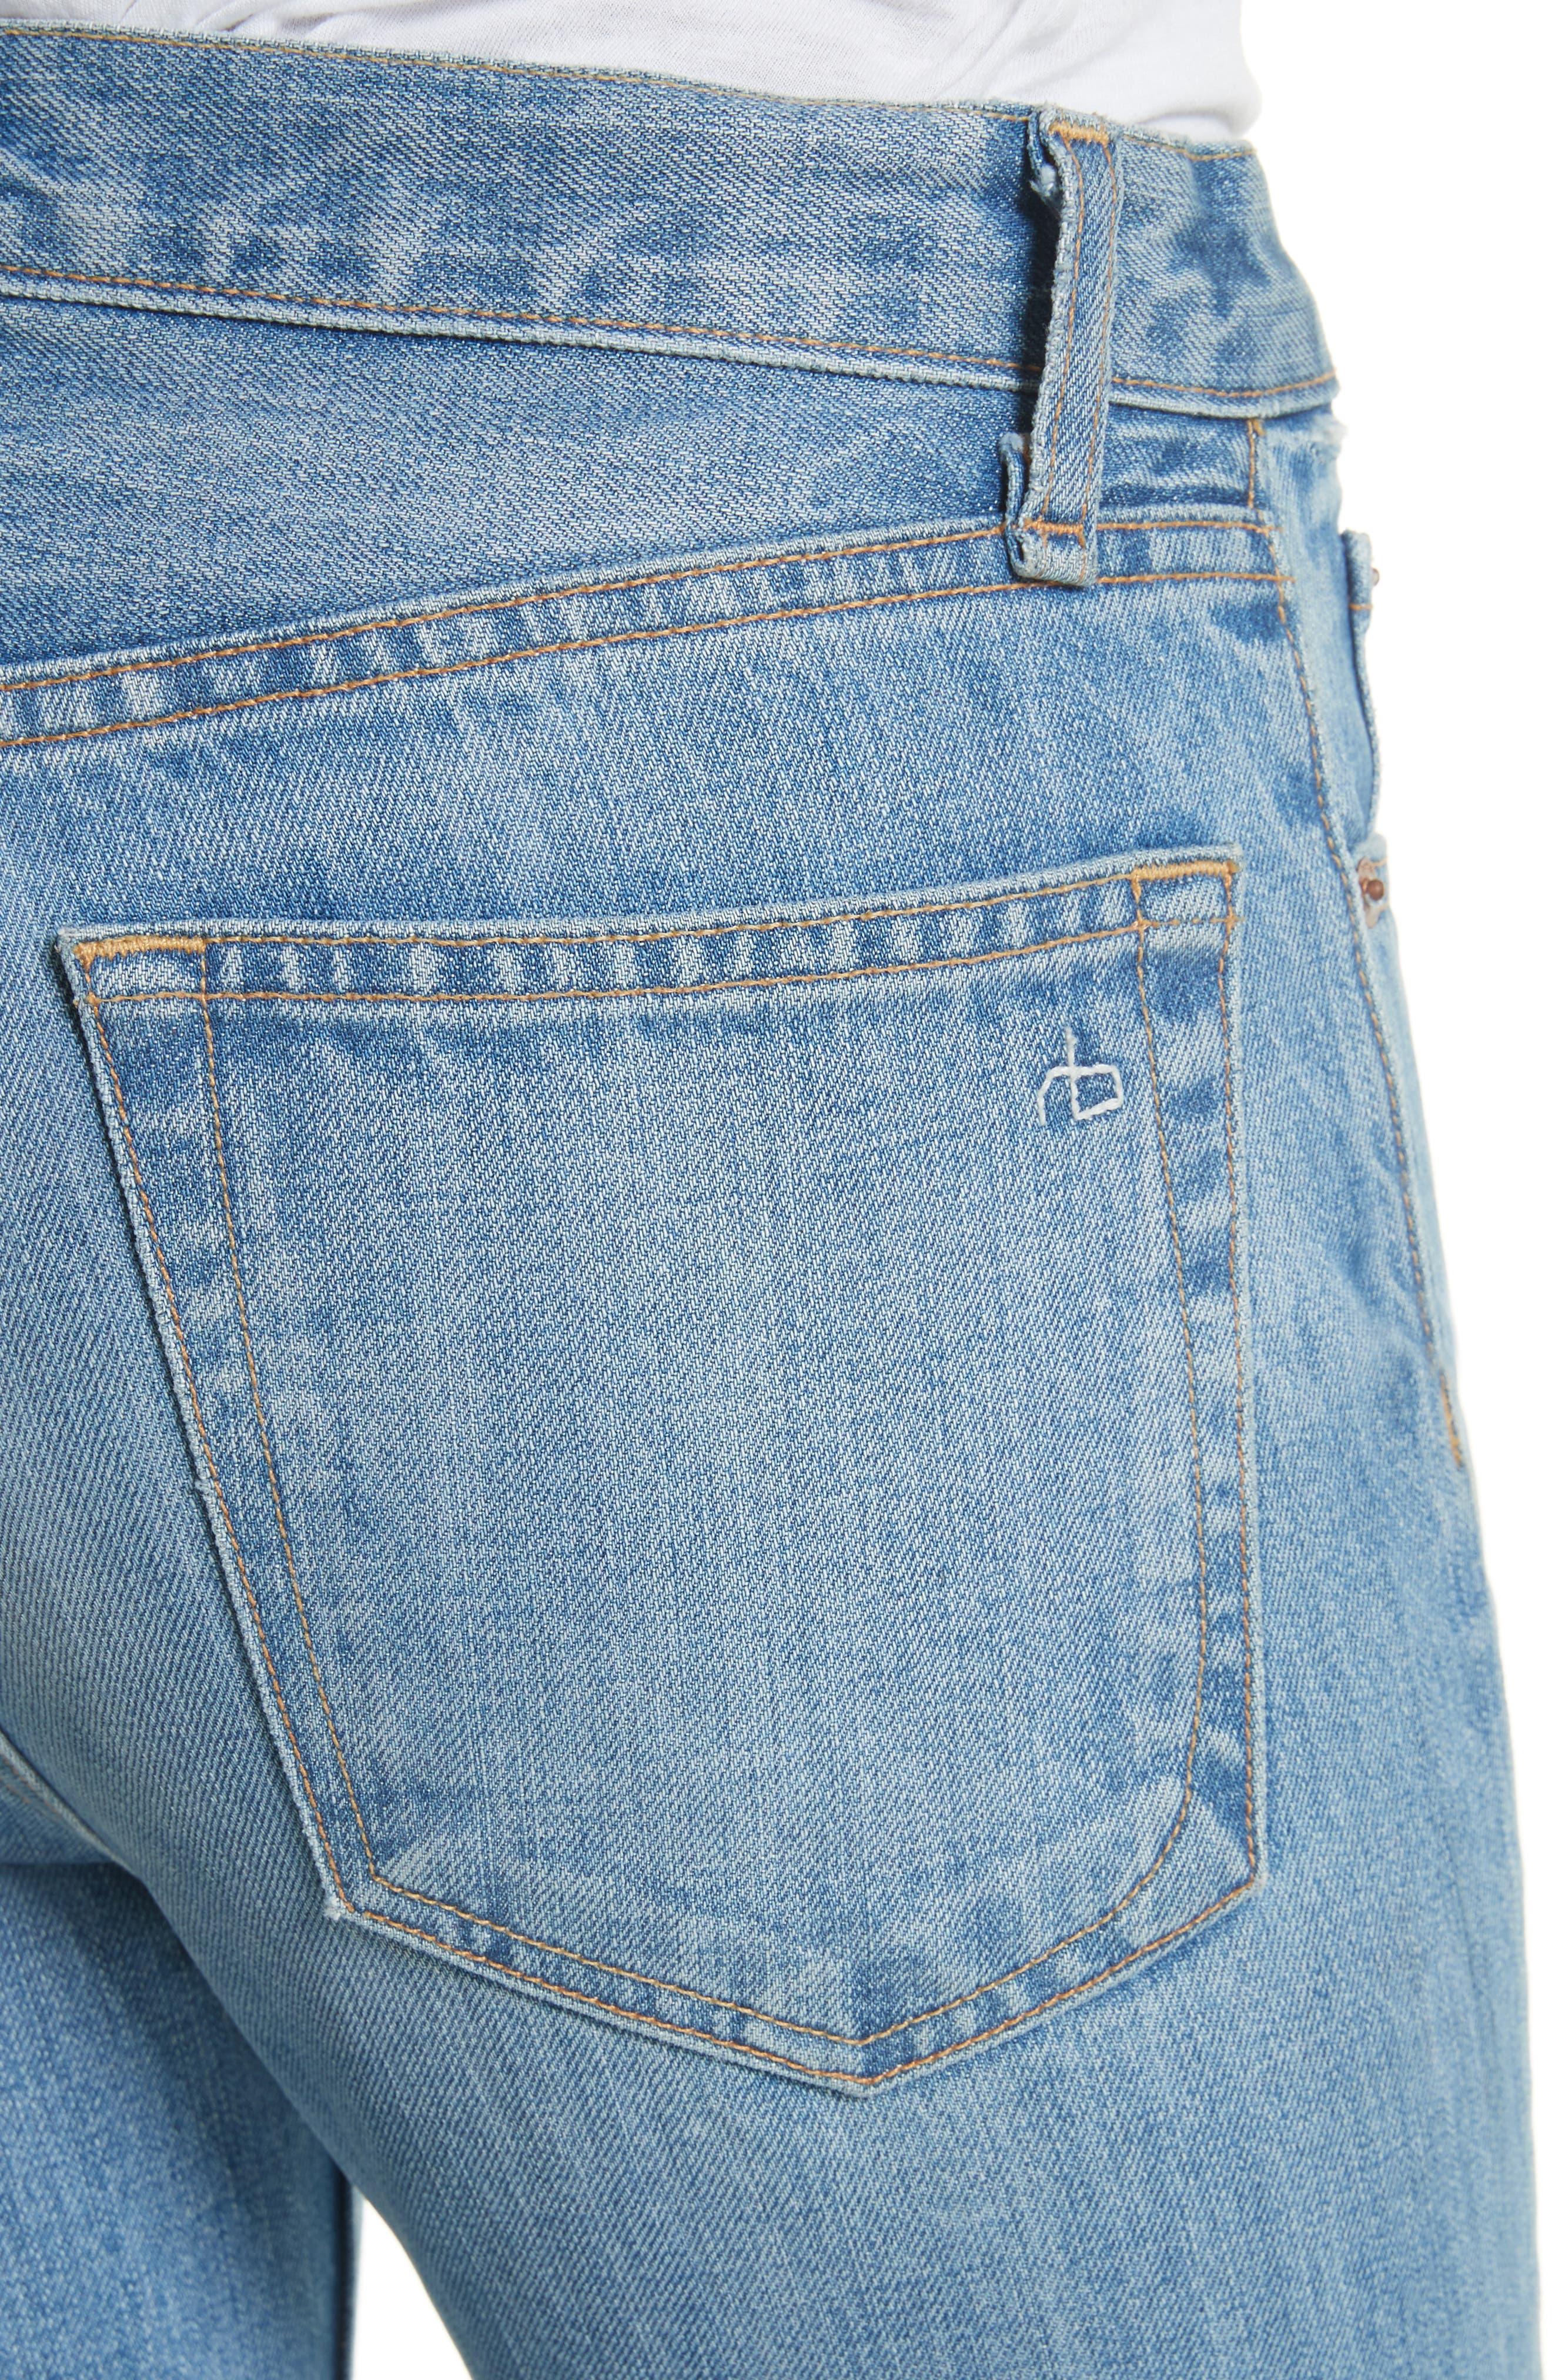 High Waist Ankle Skinny Jeans,                             Alternate thumbnail 4, color,                             Helena